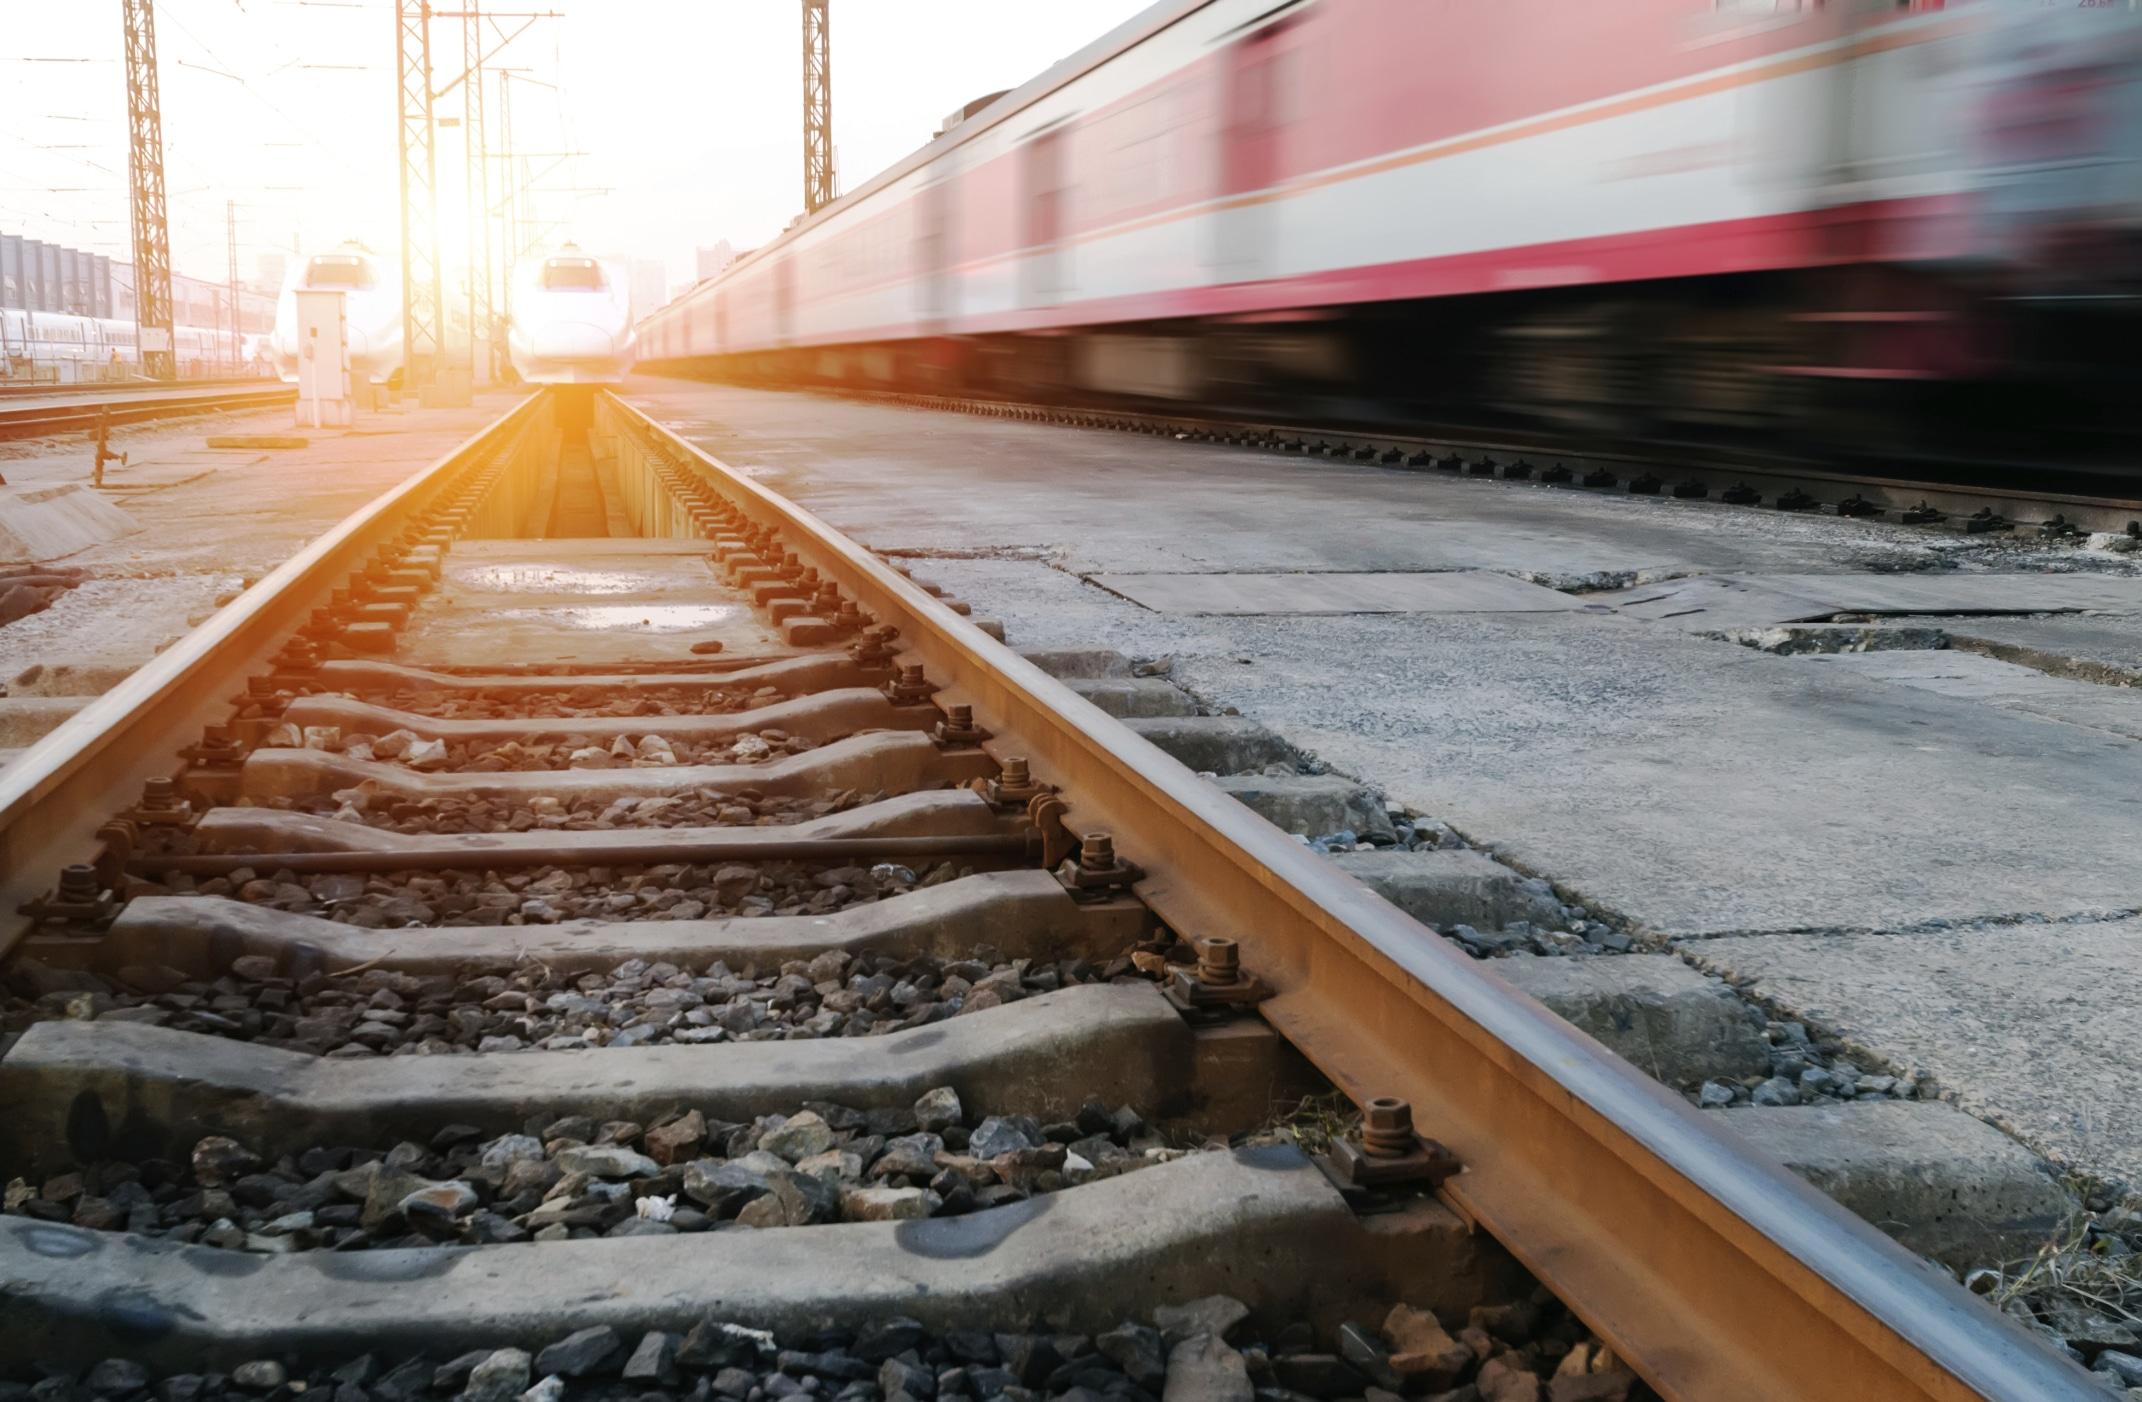 Arkansas Railroad crossing Accident